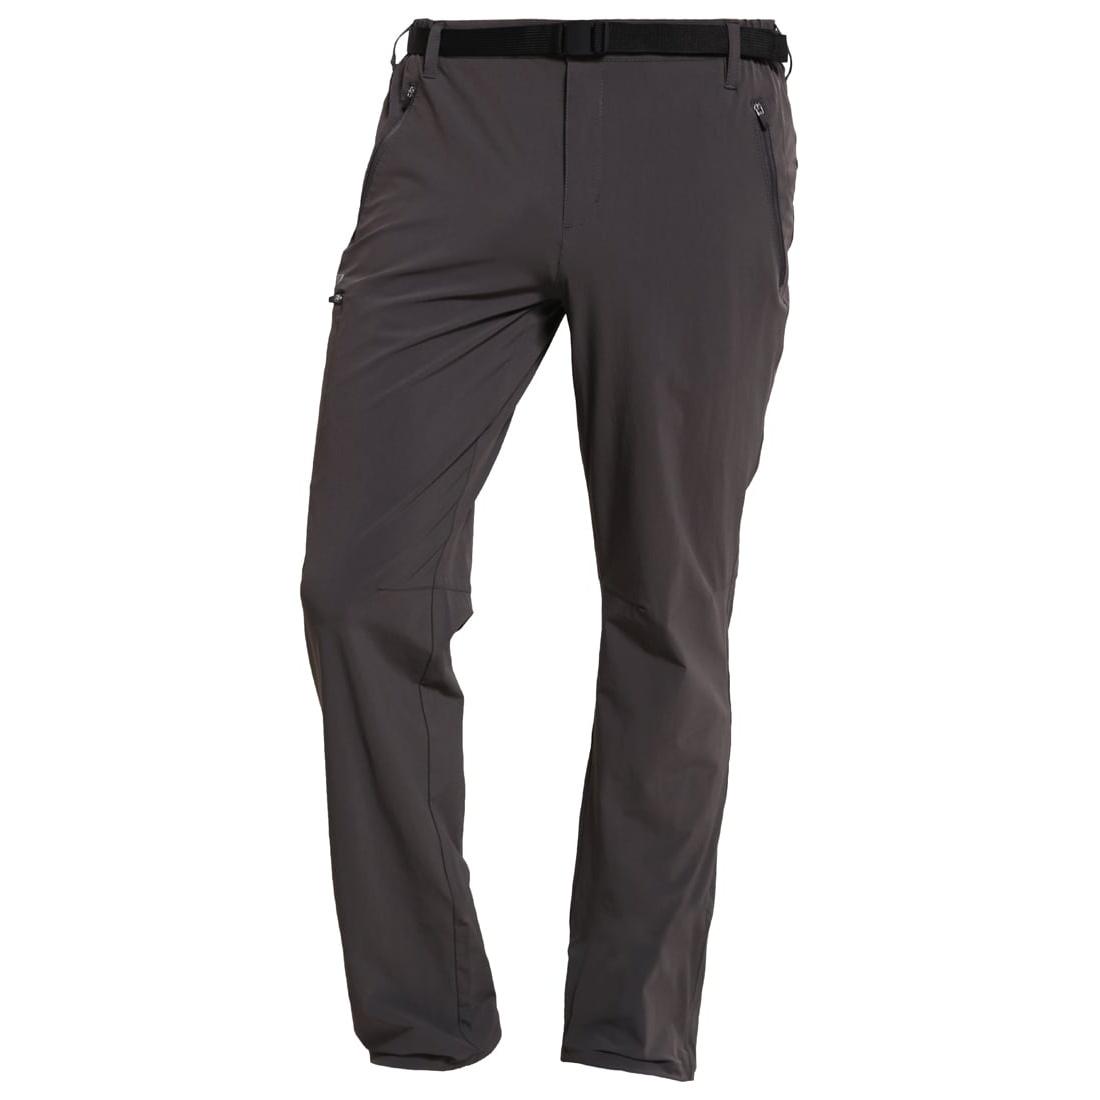 Regatta-Great-Outdoors-Mens-XERT-II-Quick-Drying-Water-Resistant-Trousers